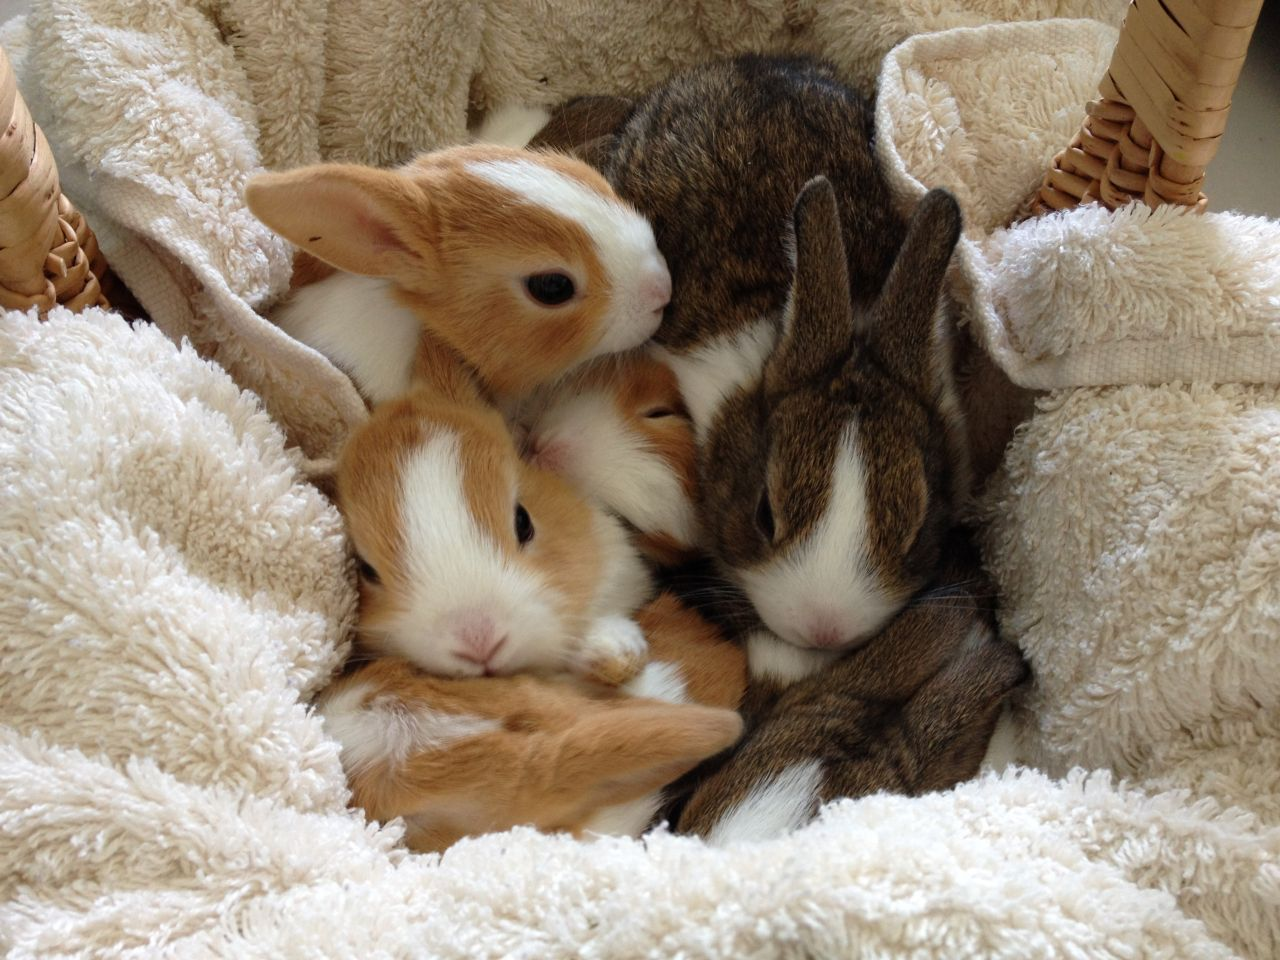 bunnies-benchmarks